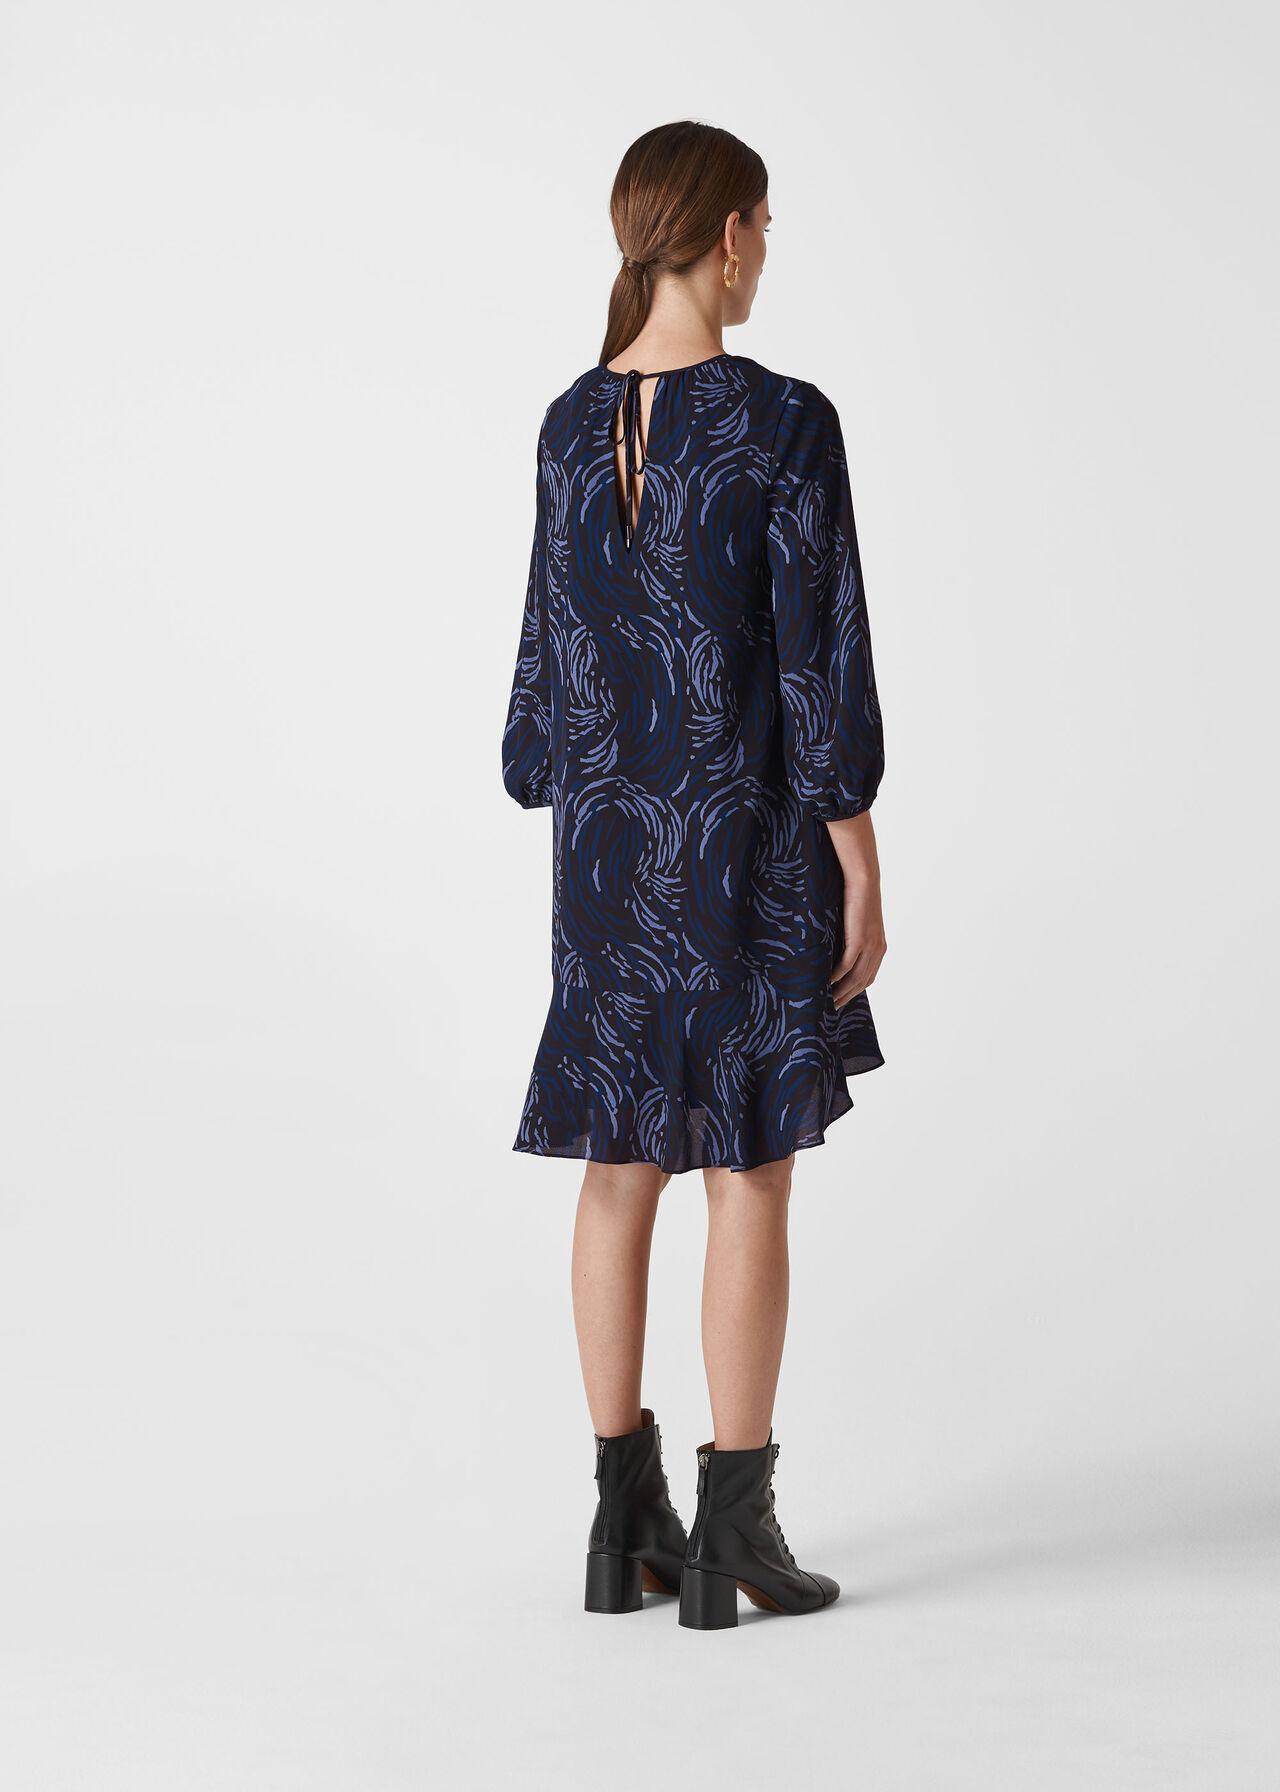 Renata Reed Print Dress